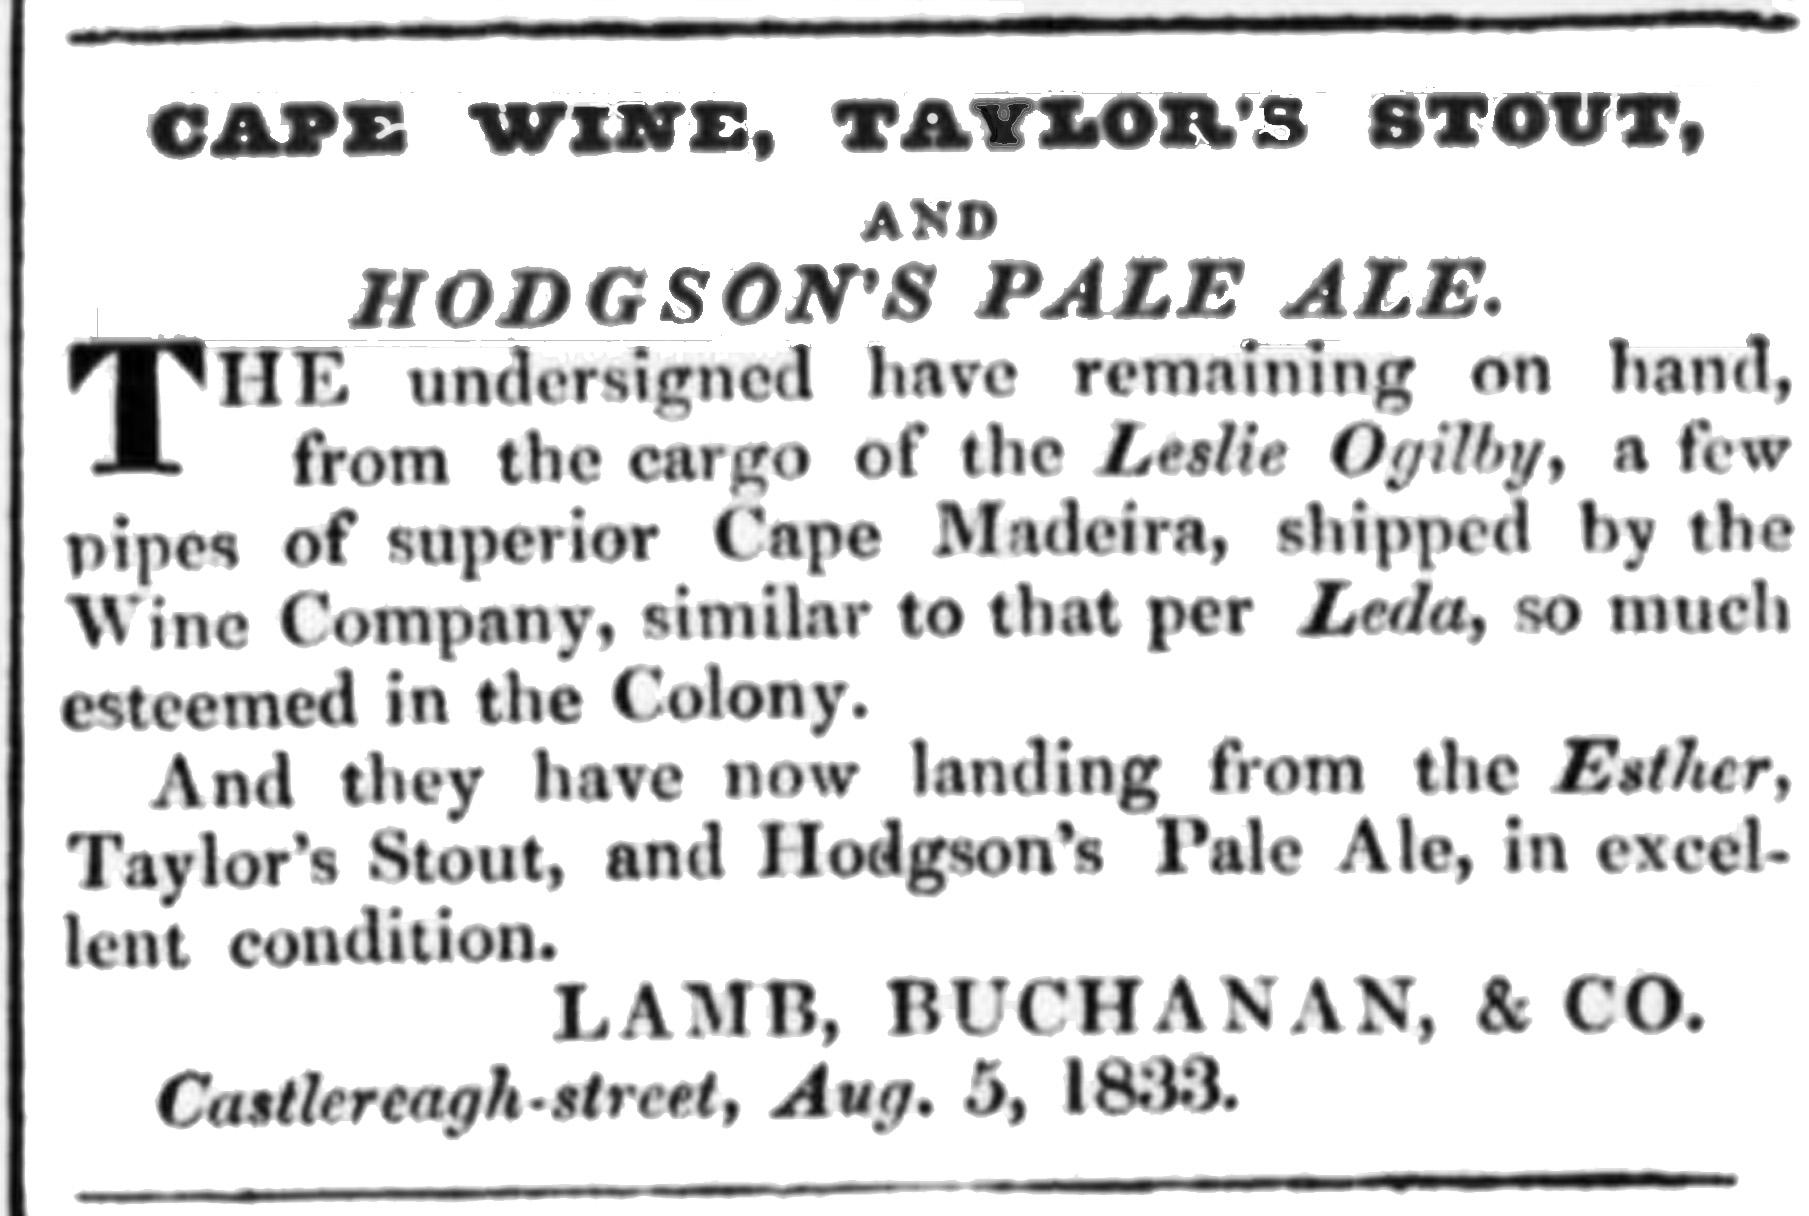 Primeira referência a Pale Ale de Hodgson